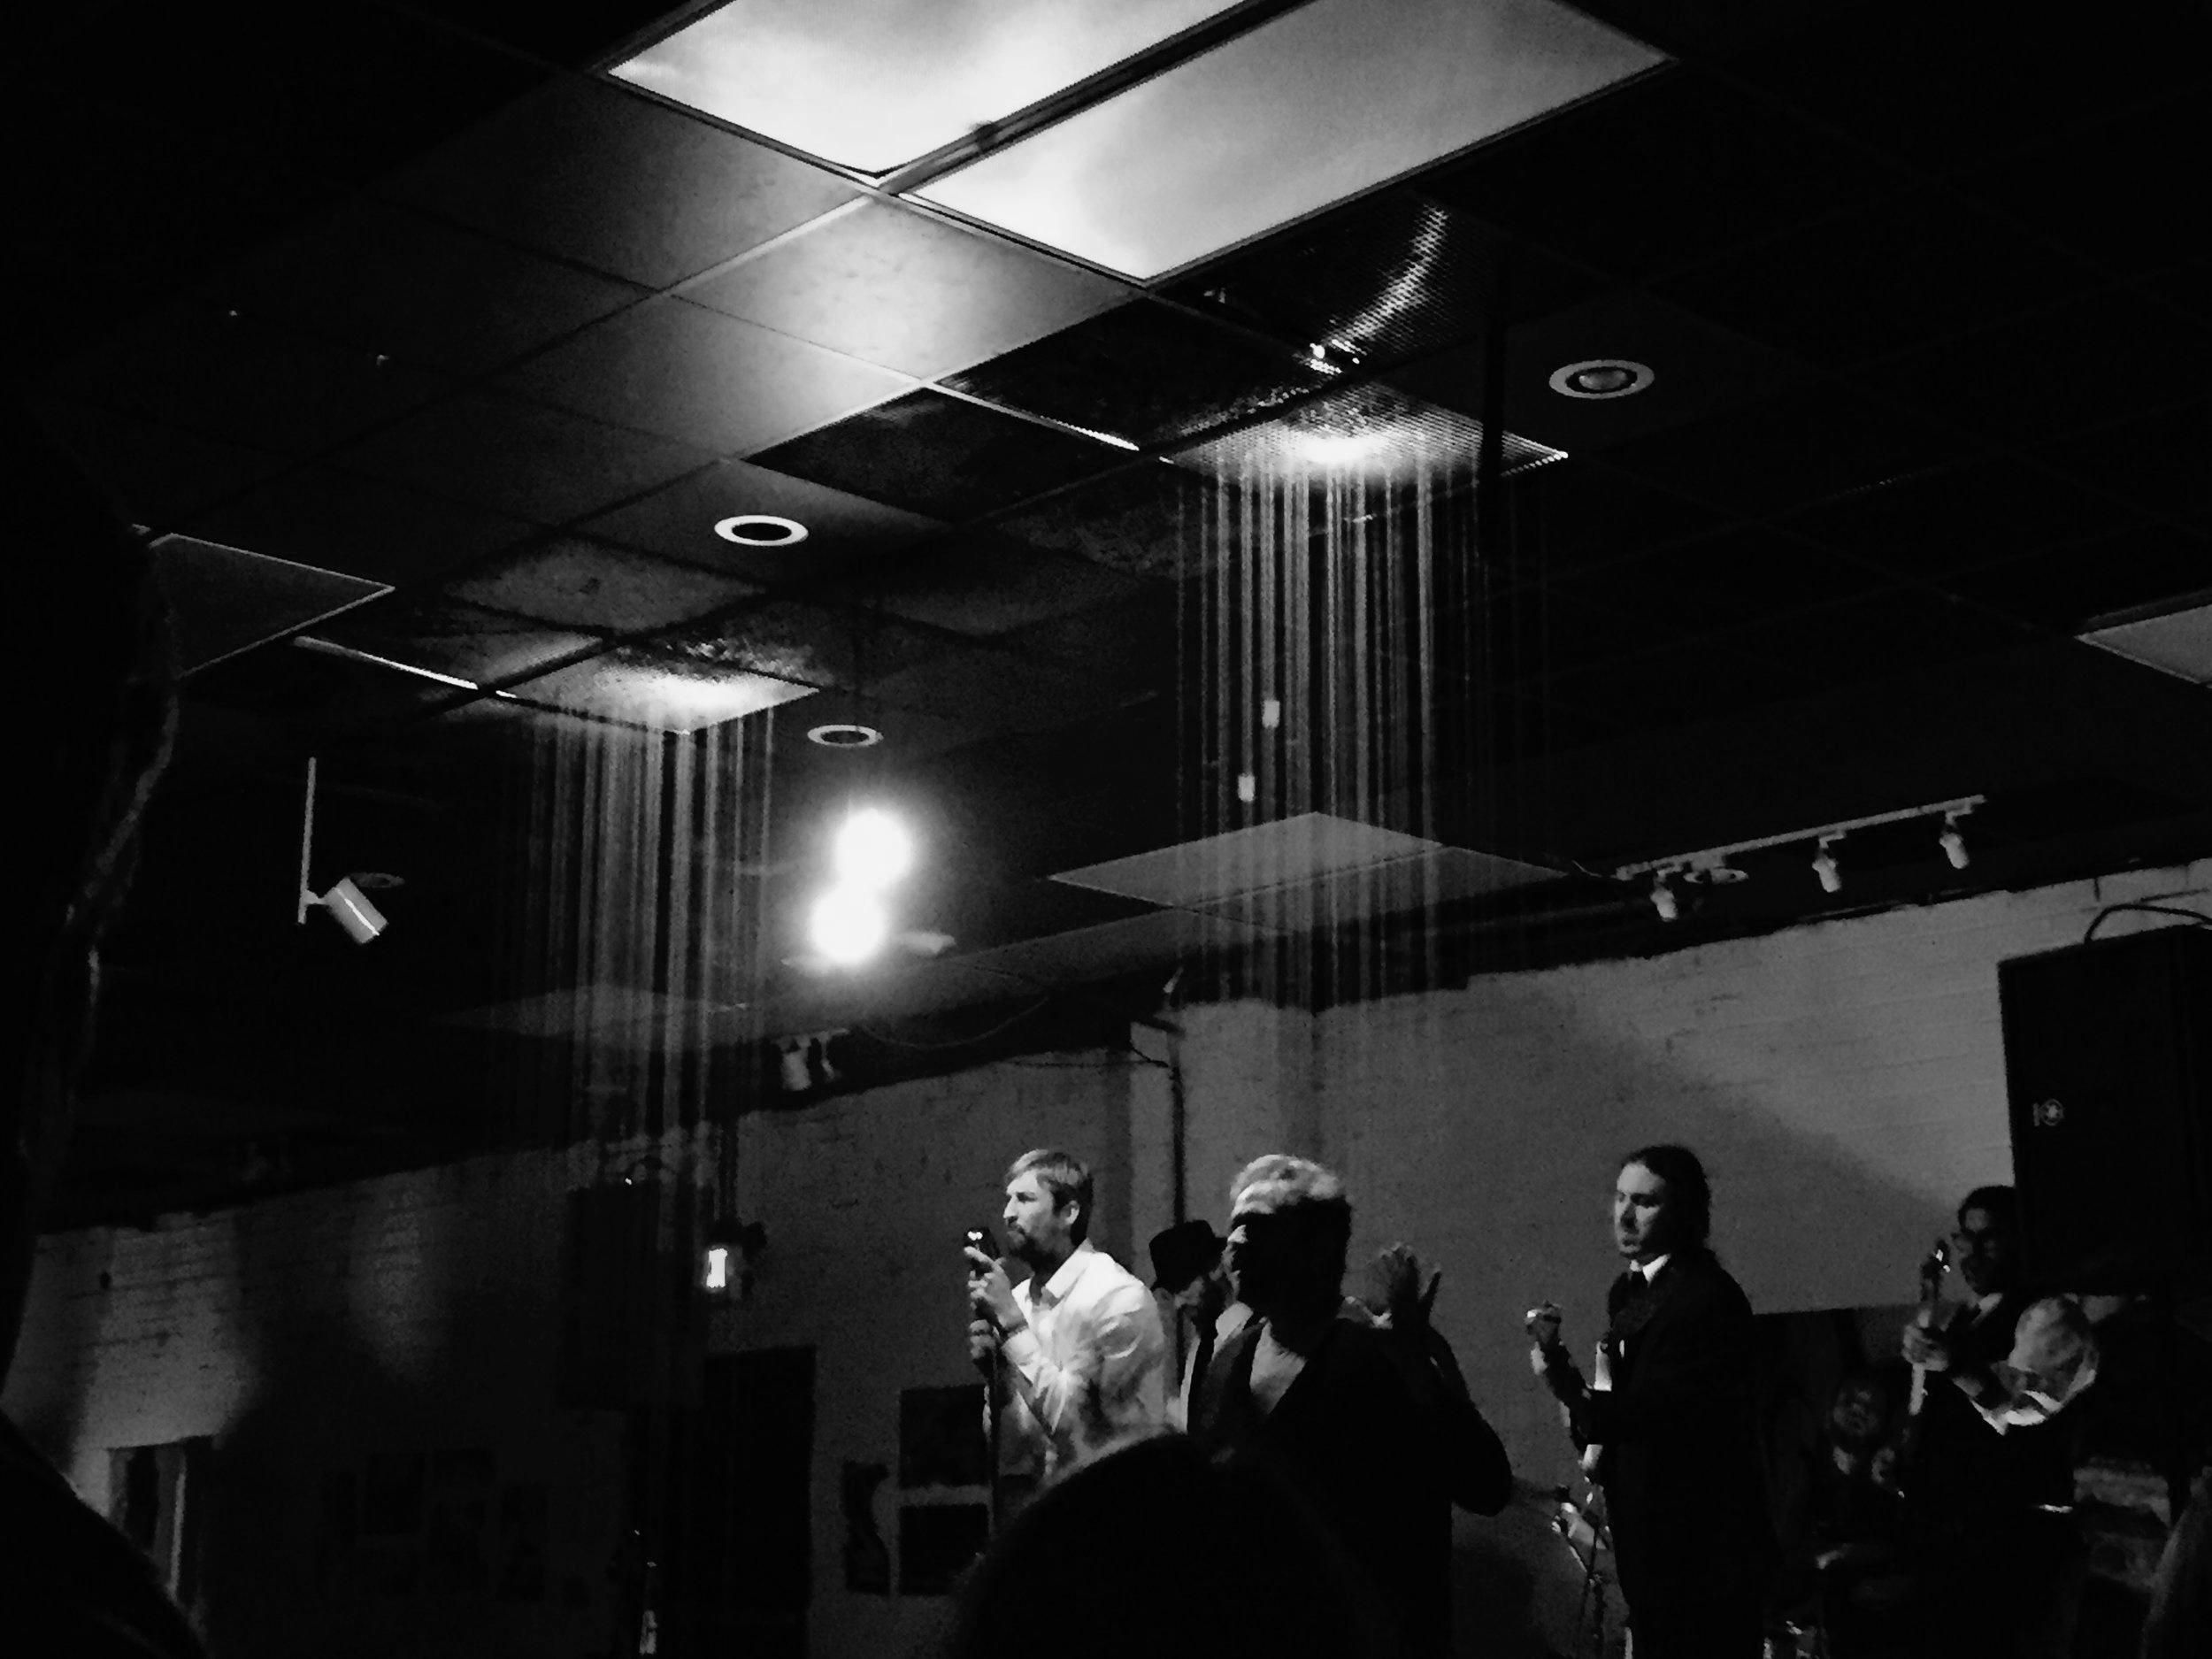 Eric Mullis, Charlie Trexler, Matt Cosper, Troy Conn, Micah Davidson.  Goodyear Arts pop-up art gallery (Charlotte, NC) on 12/2/2017.